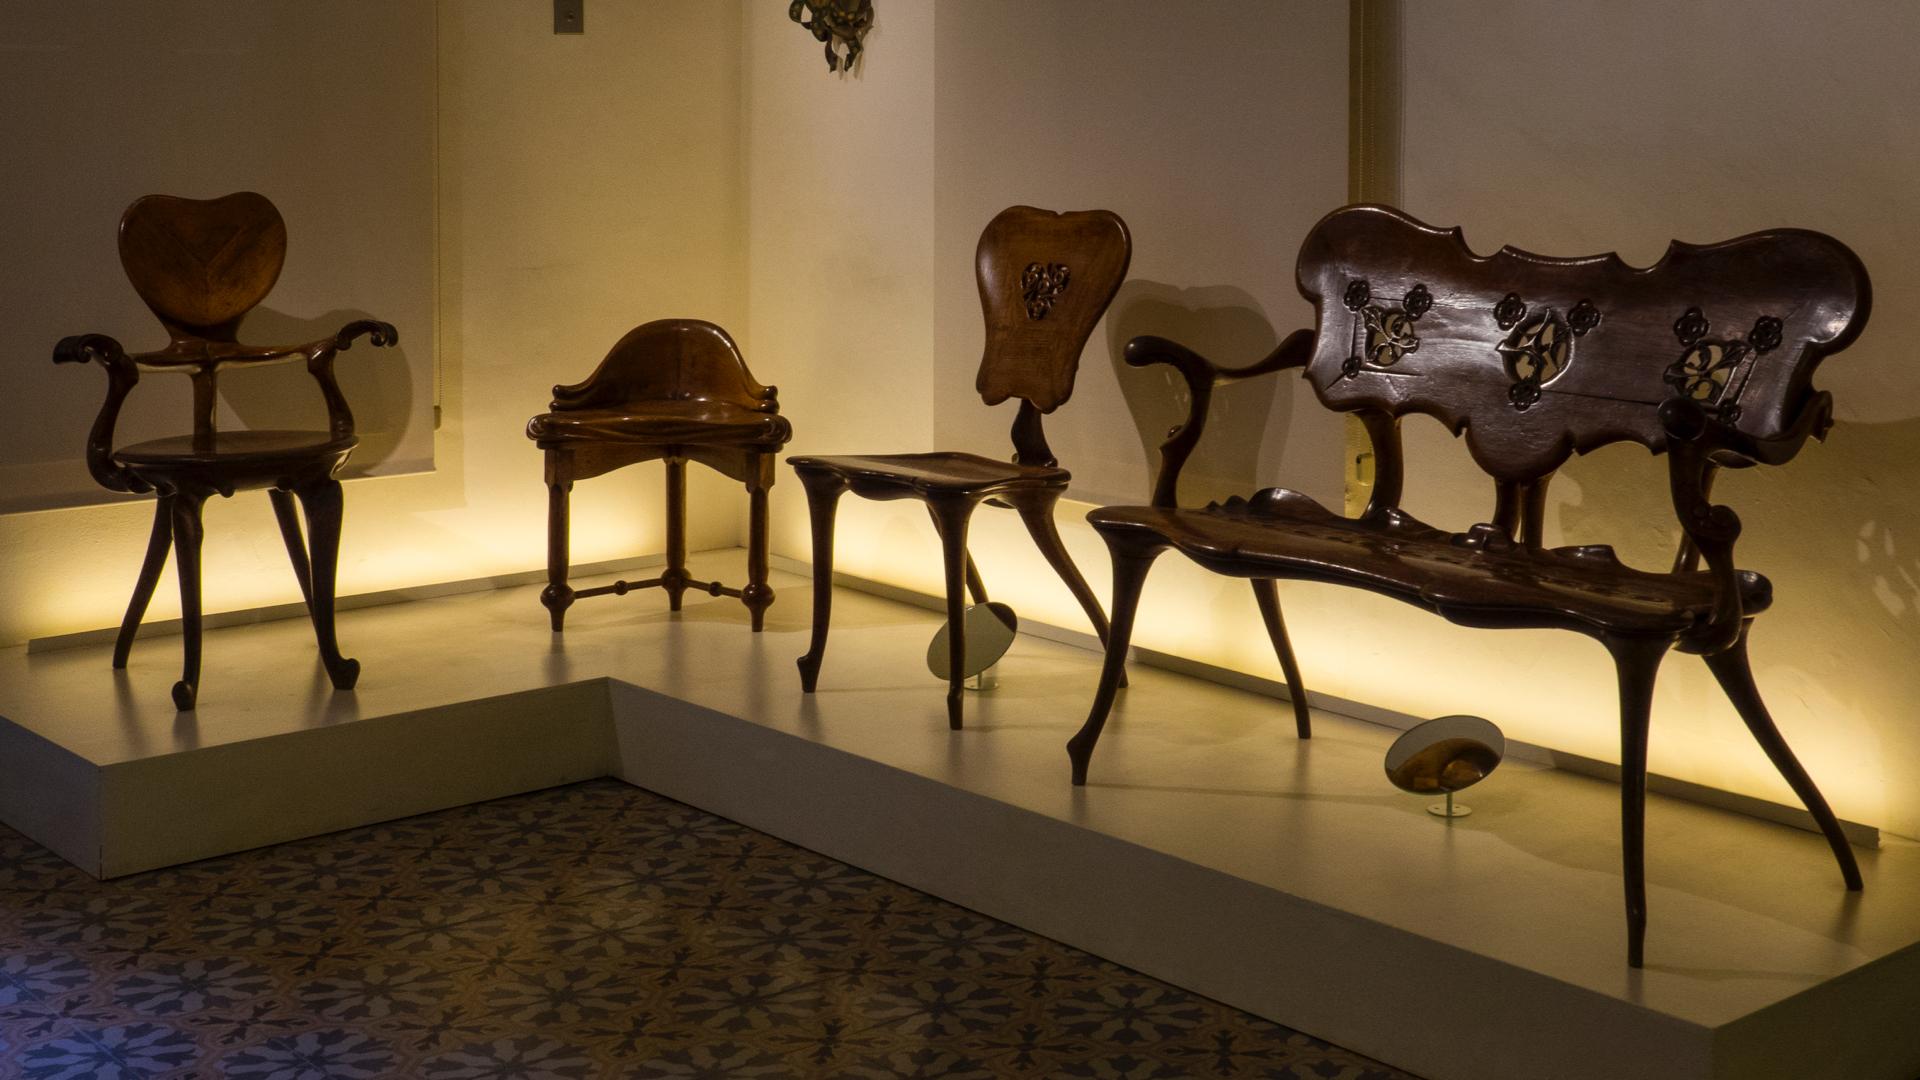 Some of the unique furniture that Gaudi had designed.